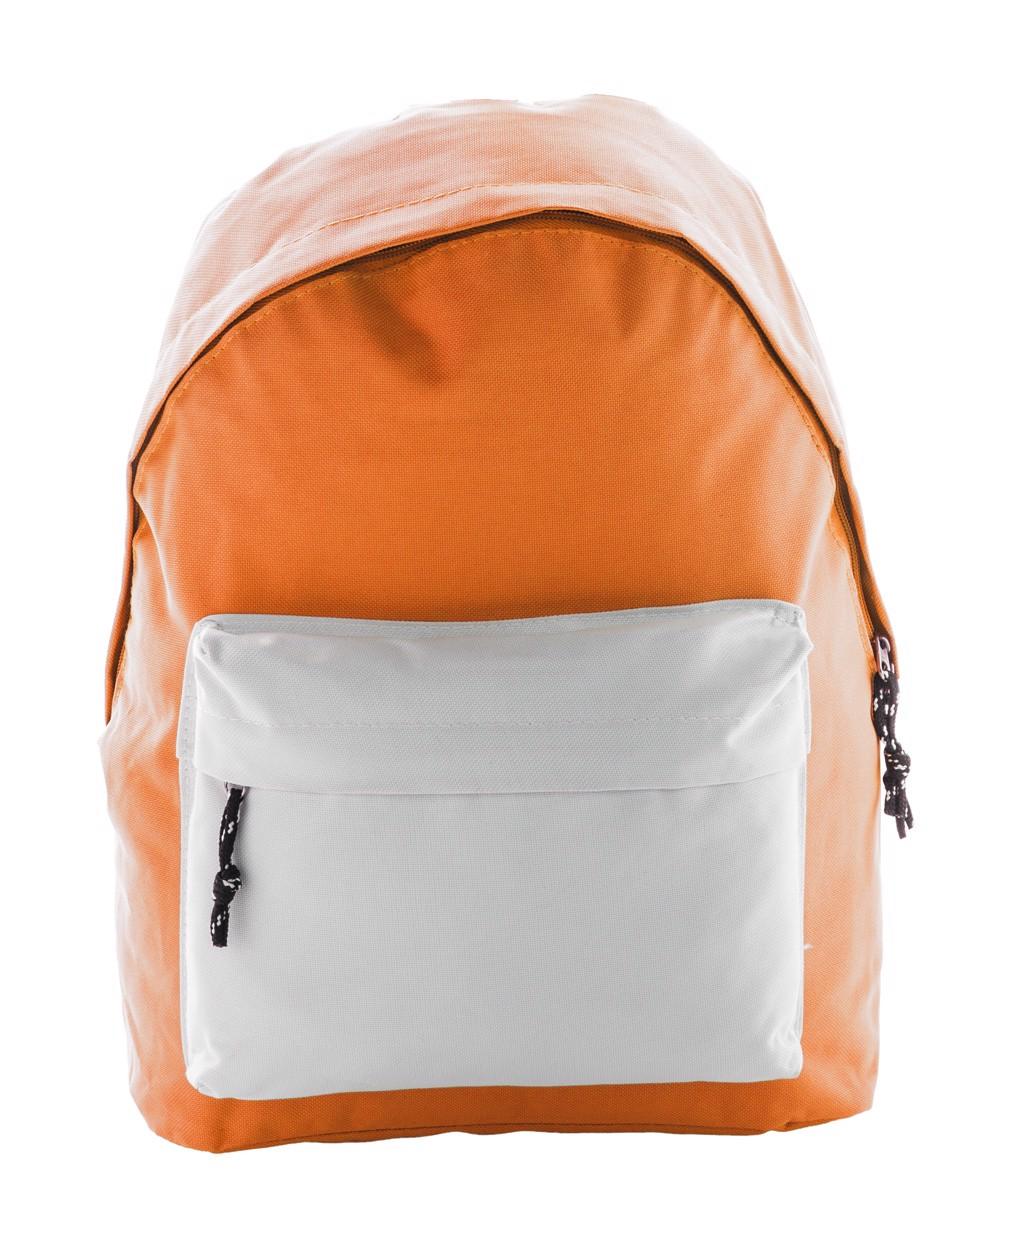 Batoh Discovery - Oranžová / Bílá